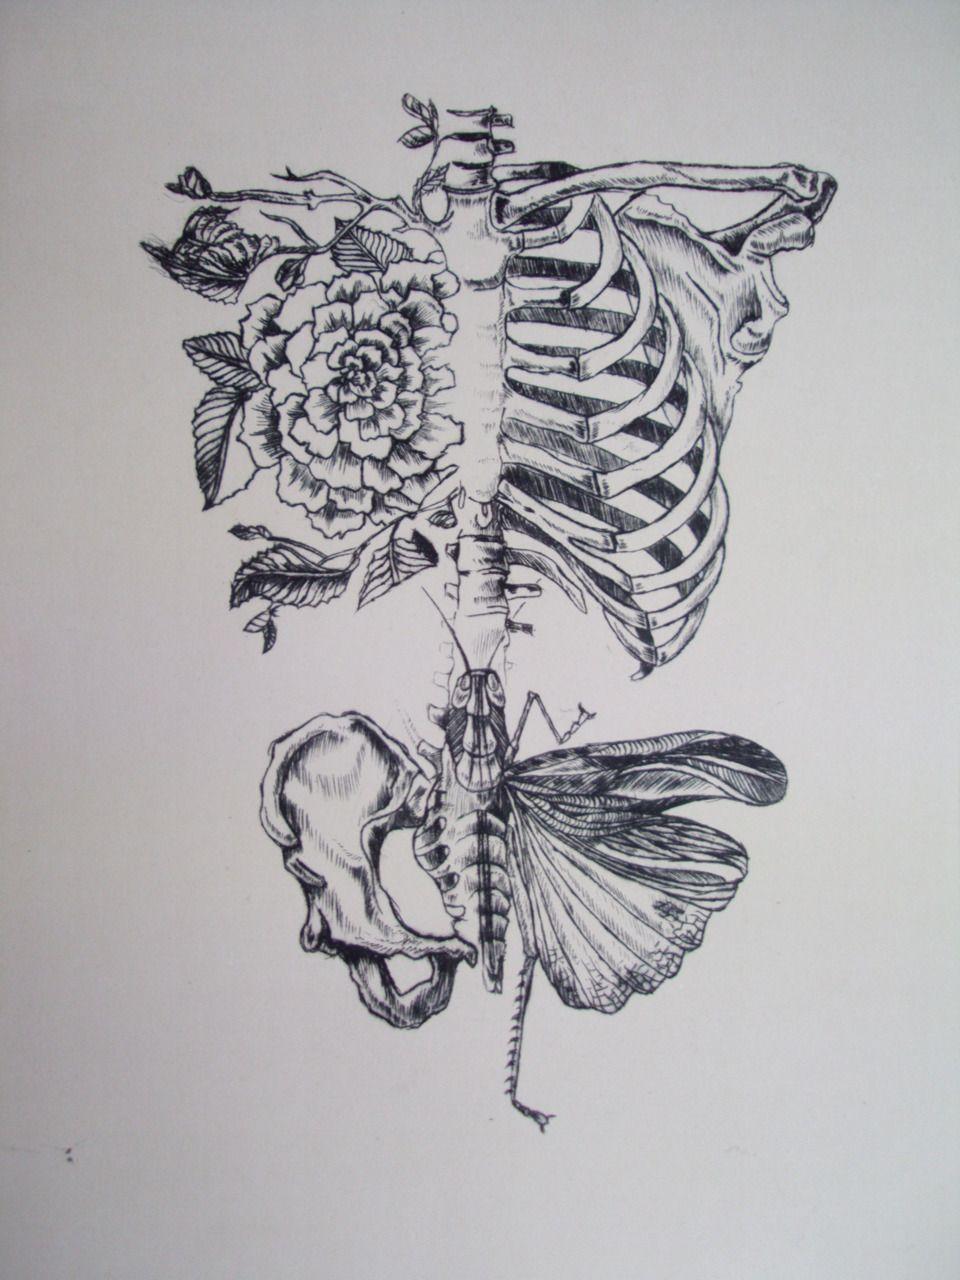 gilkey62 | Tattoos all around! | Pinterest | Tattoo ideen, Neocortex ...